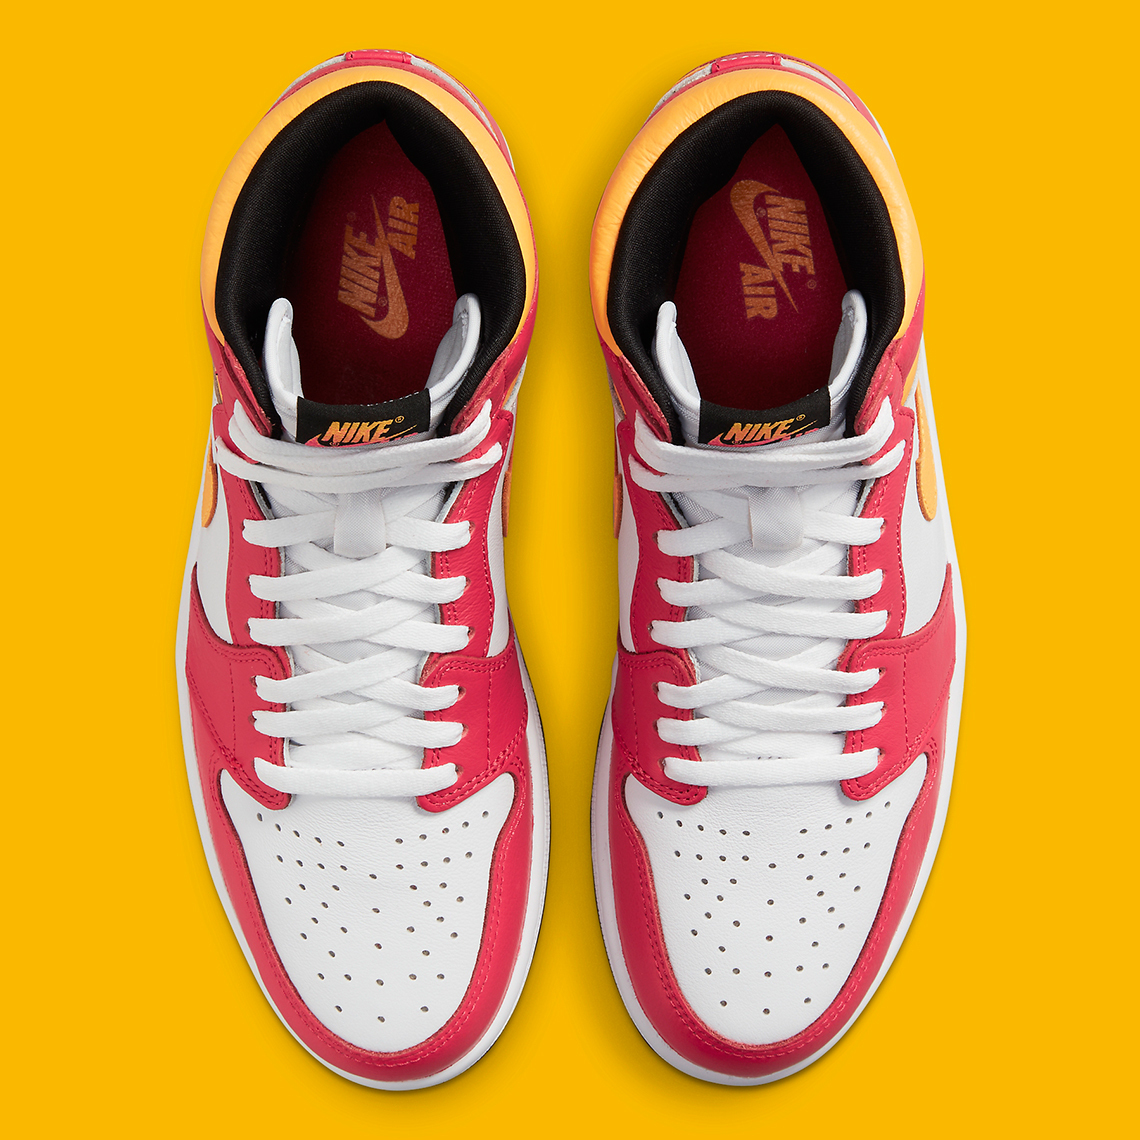 Air Jordan 1 Retro High OG ''Light Fusion Red'' - 555088-603